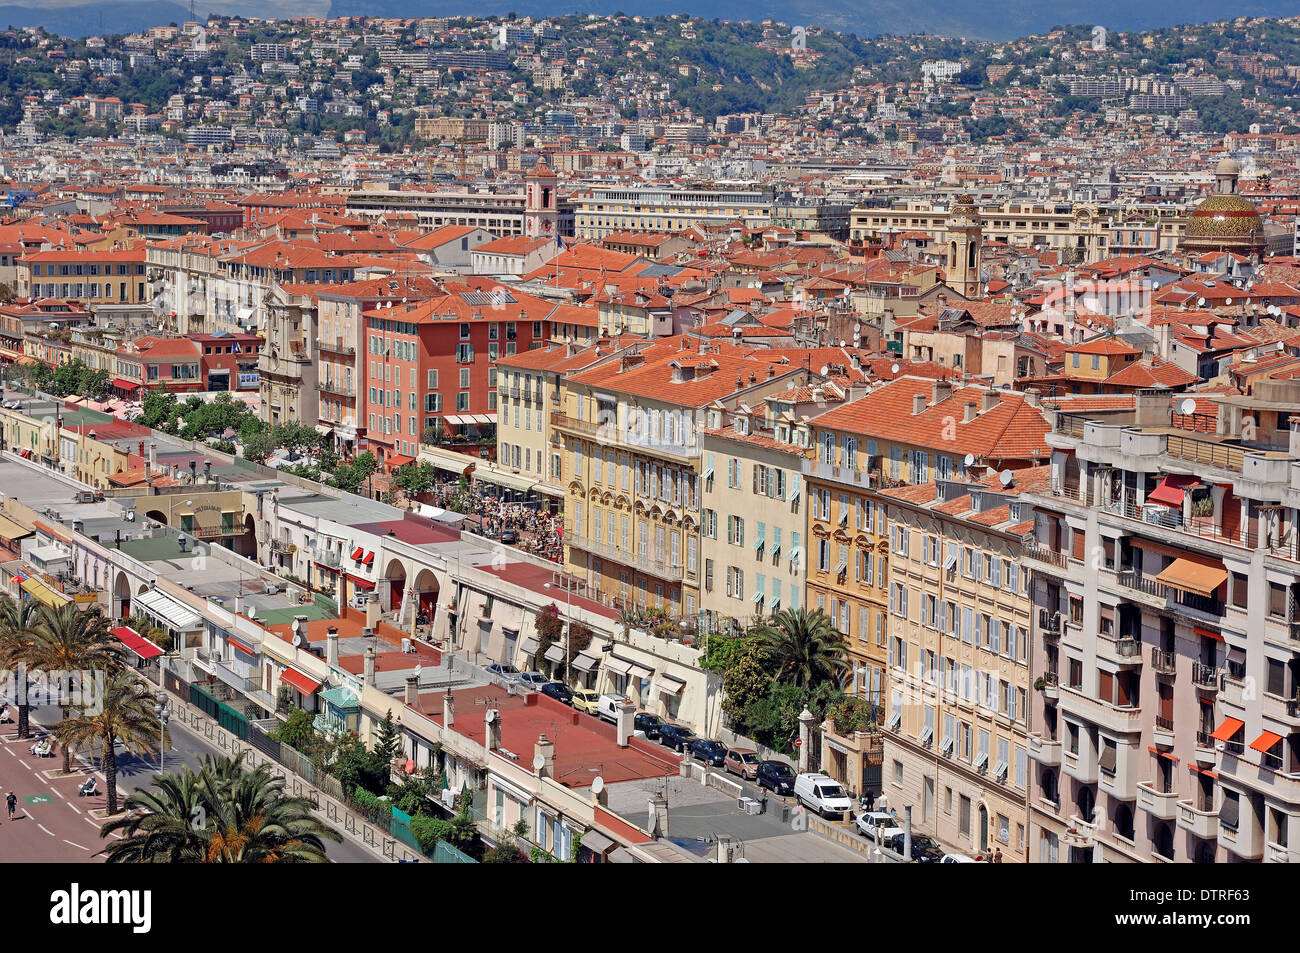 Nice, Alpes-Maritimes, Provence-Alpes-Cote d'Azur, Southern France - Stock Image